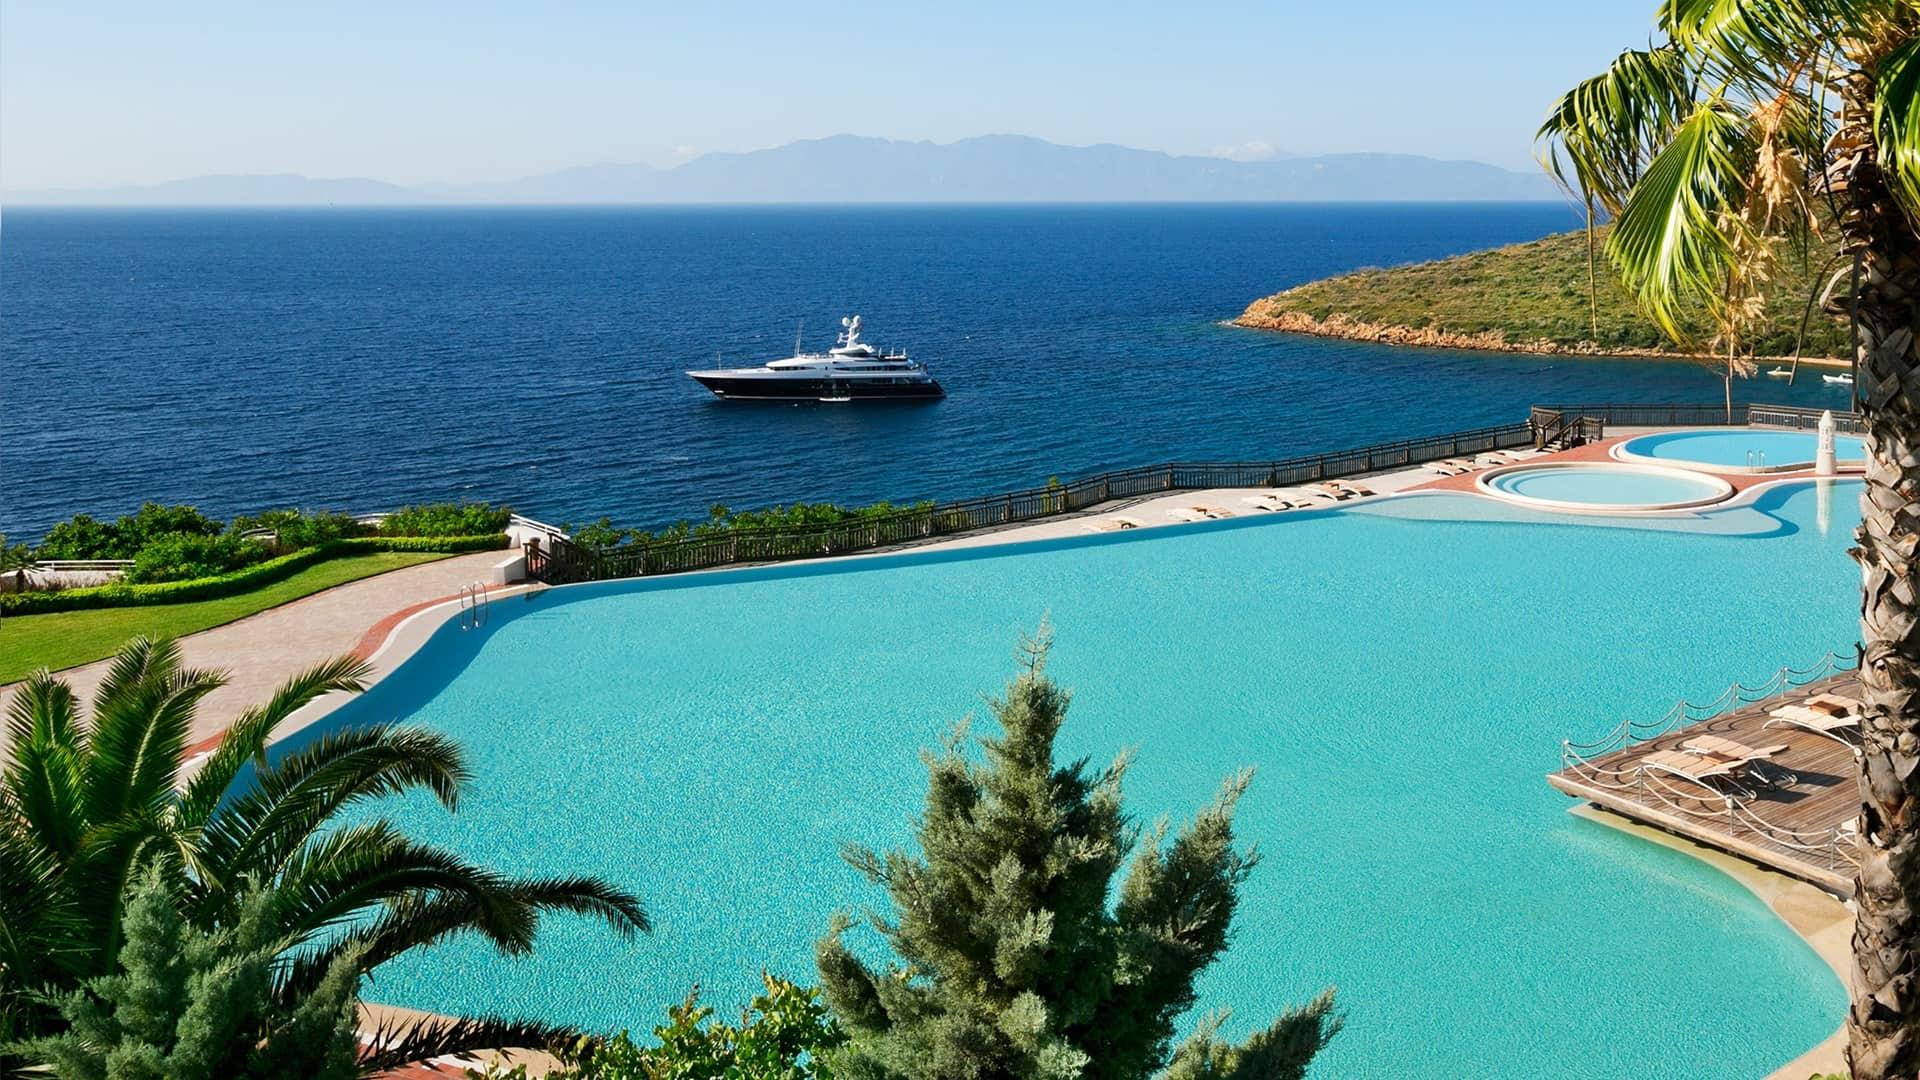 Kempinski Hotel Barbaros Bay Bodrum pool